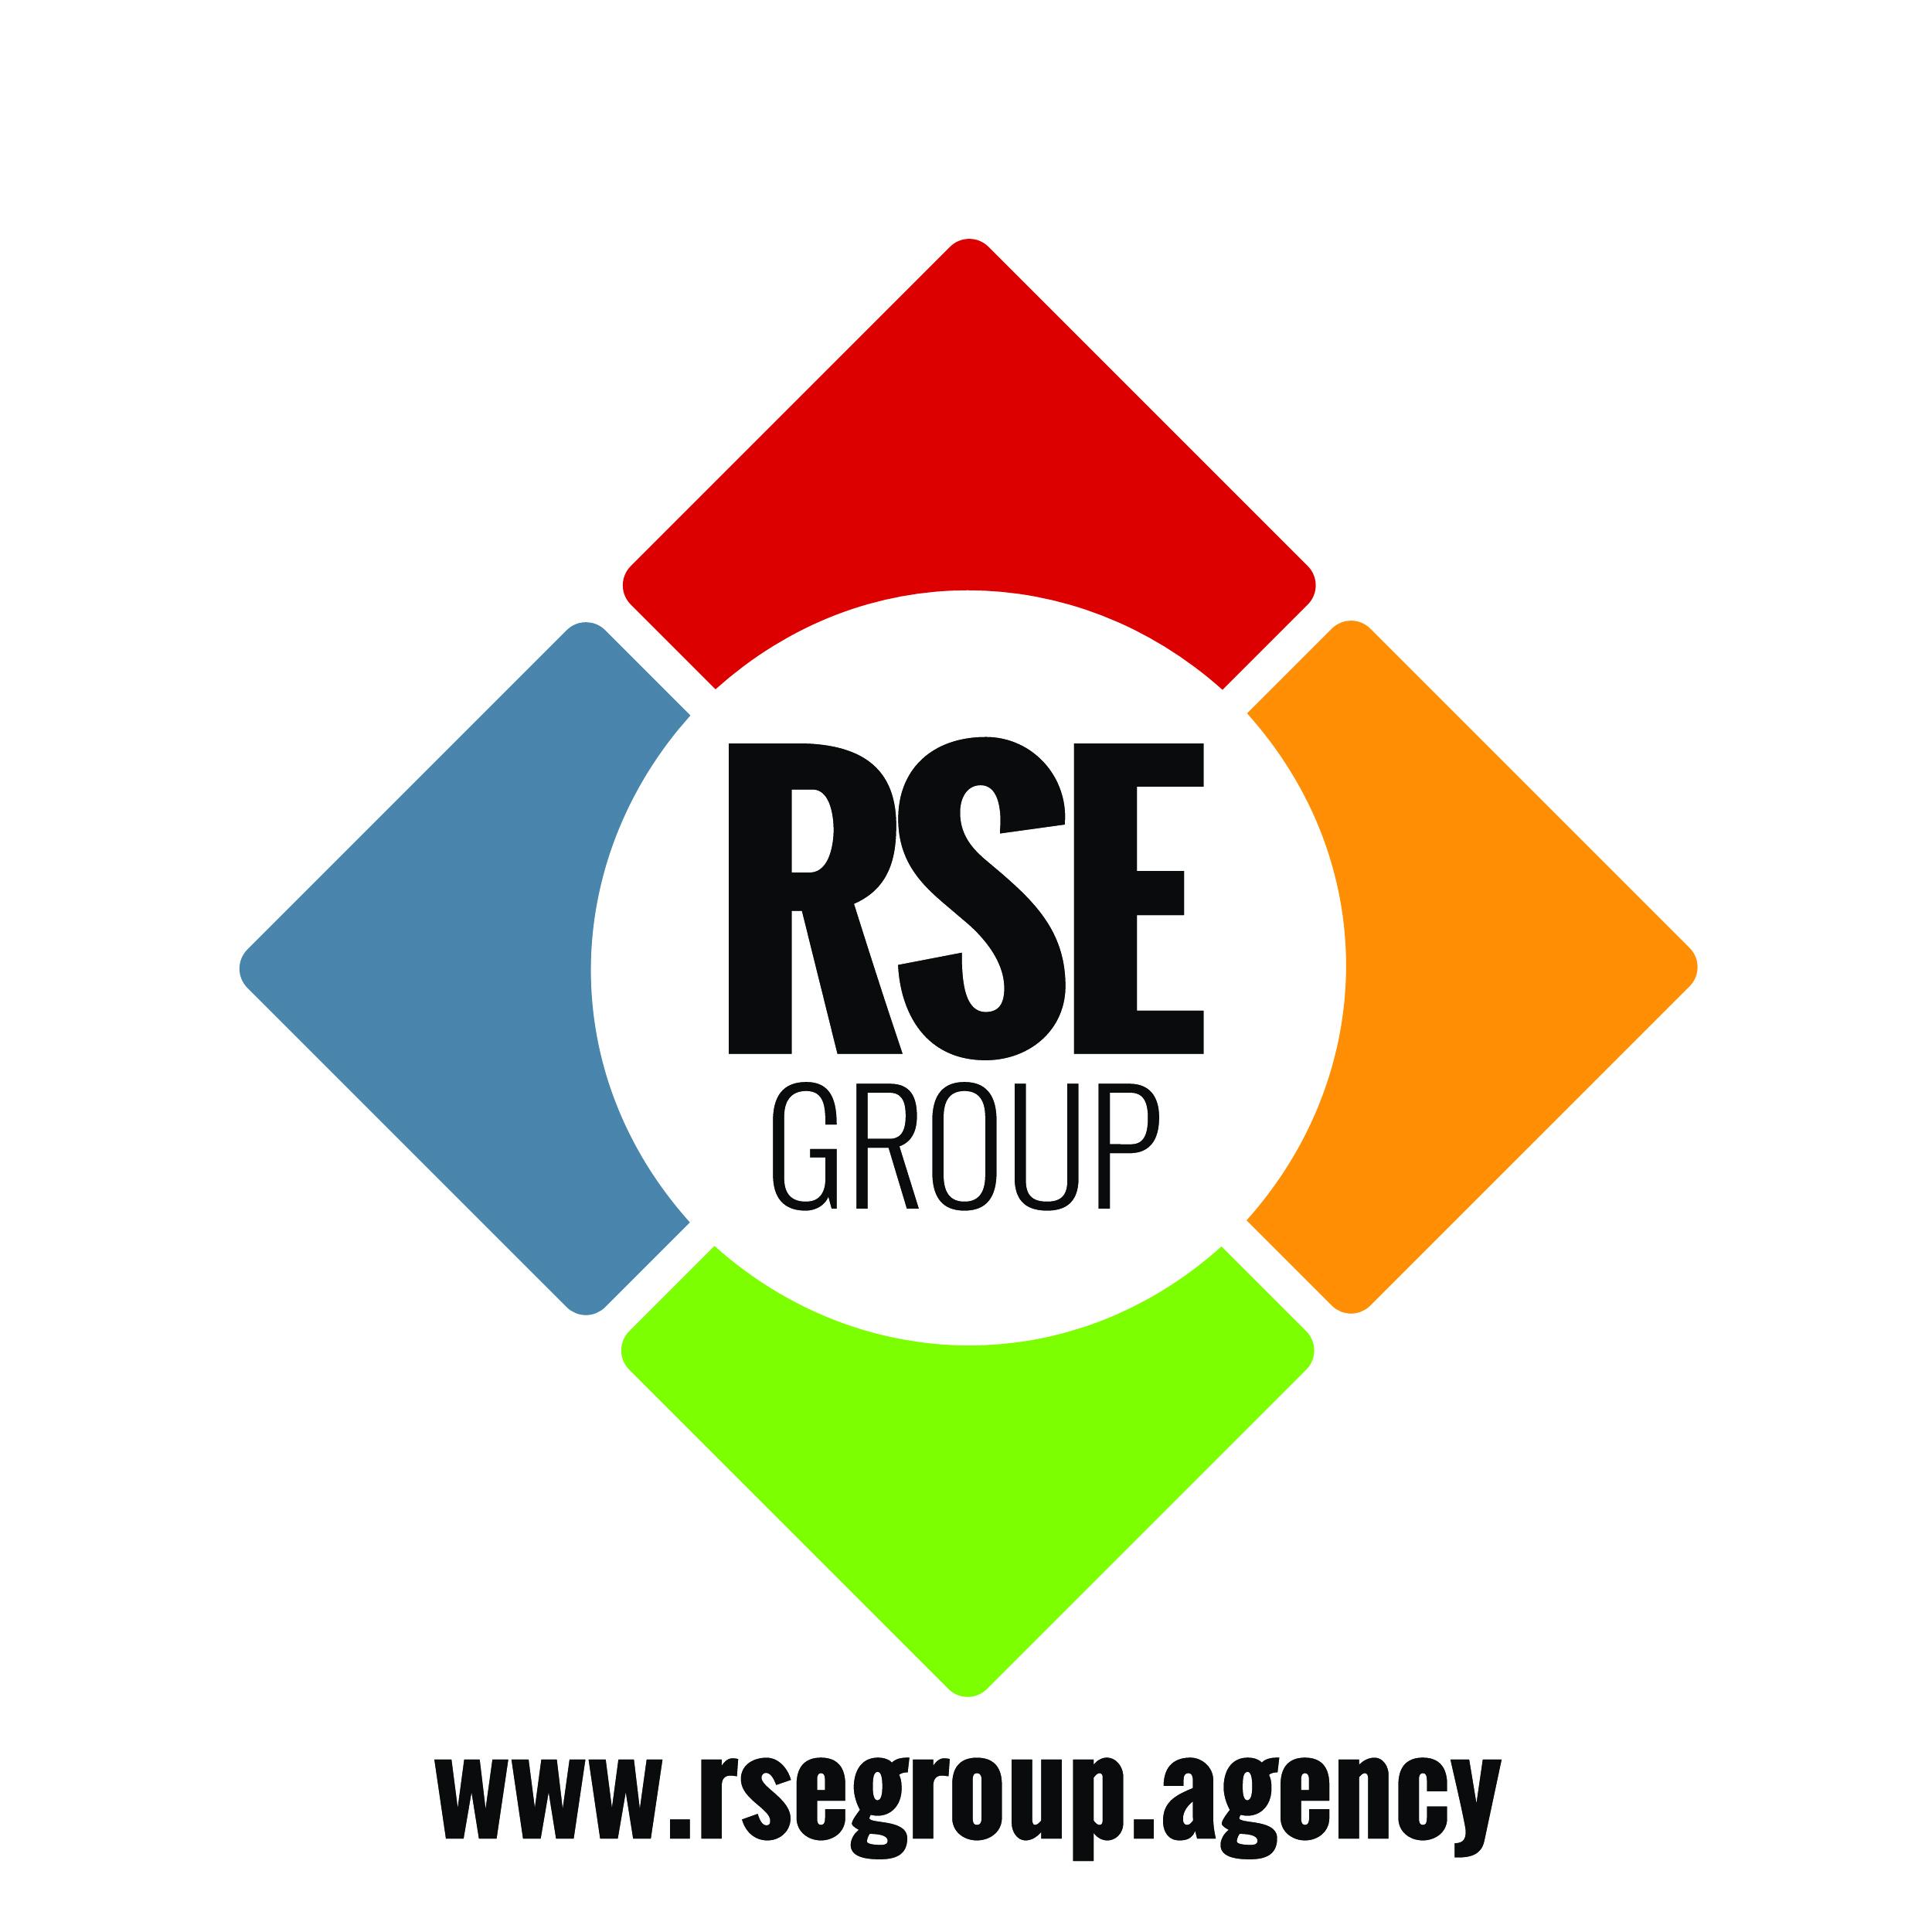 RSE Group logo